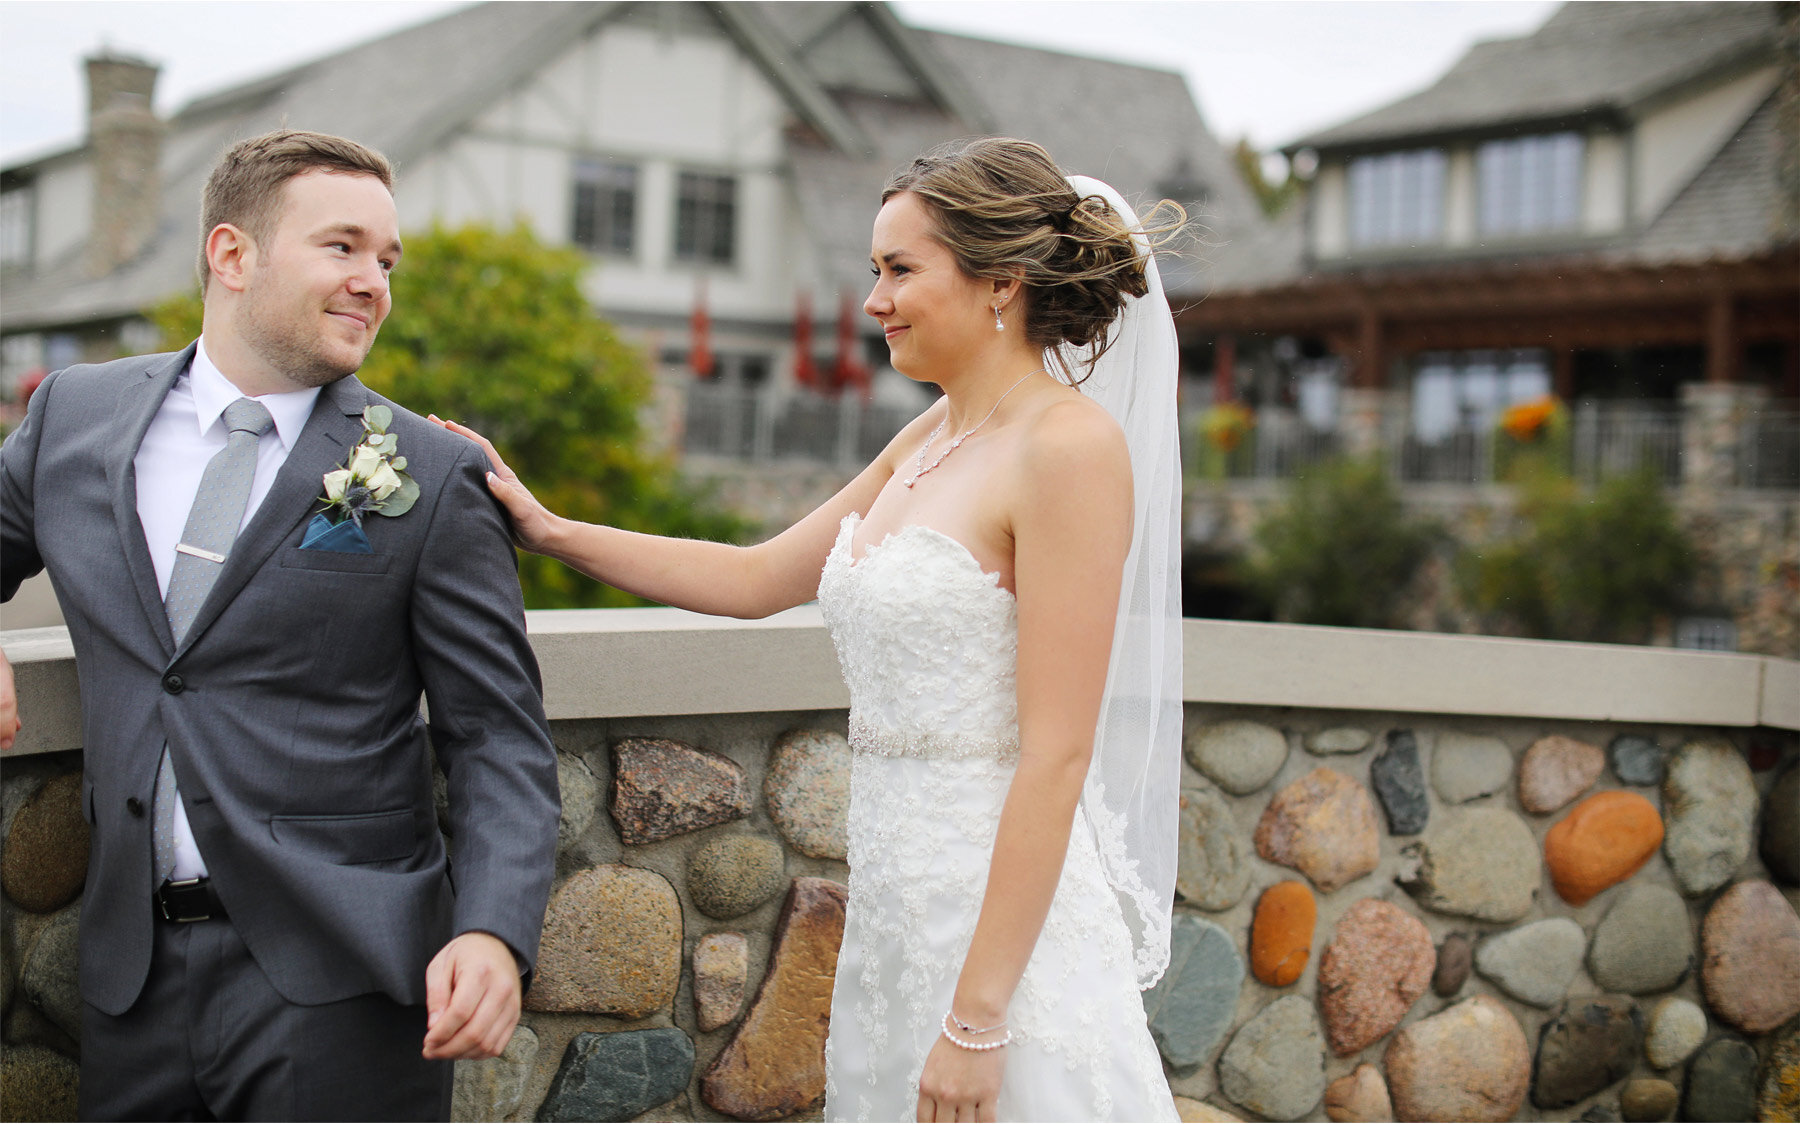 02-Vick-Photography-Minneapolis-Minnesota-Wedding-Rush-Creek-Golf-Club-Groom-Bride-First-Look-Amanda-and-Michael.jpg